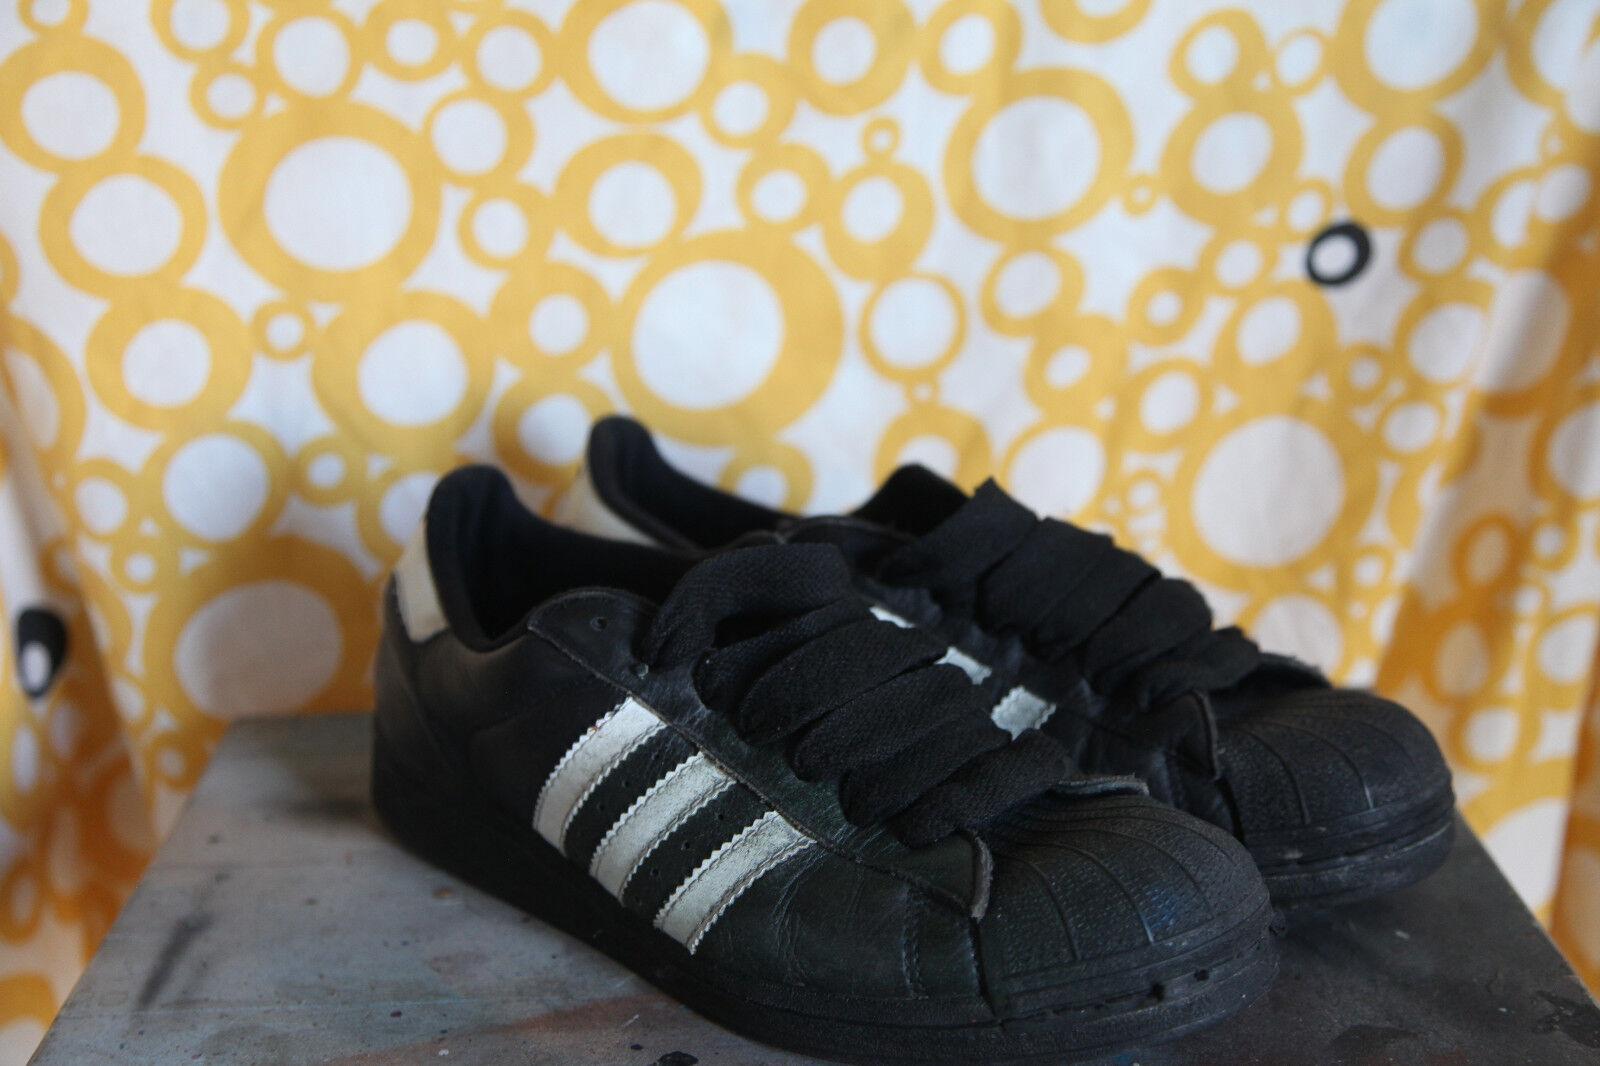 Adidas superstar nero 'degli / bianco sz noi 9 meta 'degli nero anni' 90 e900f5